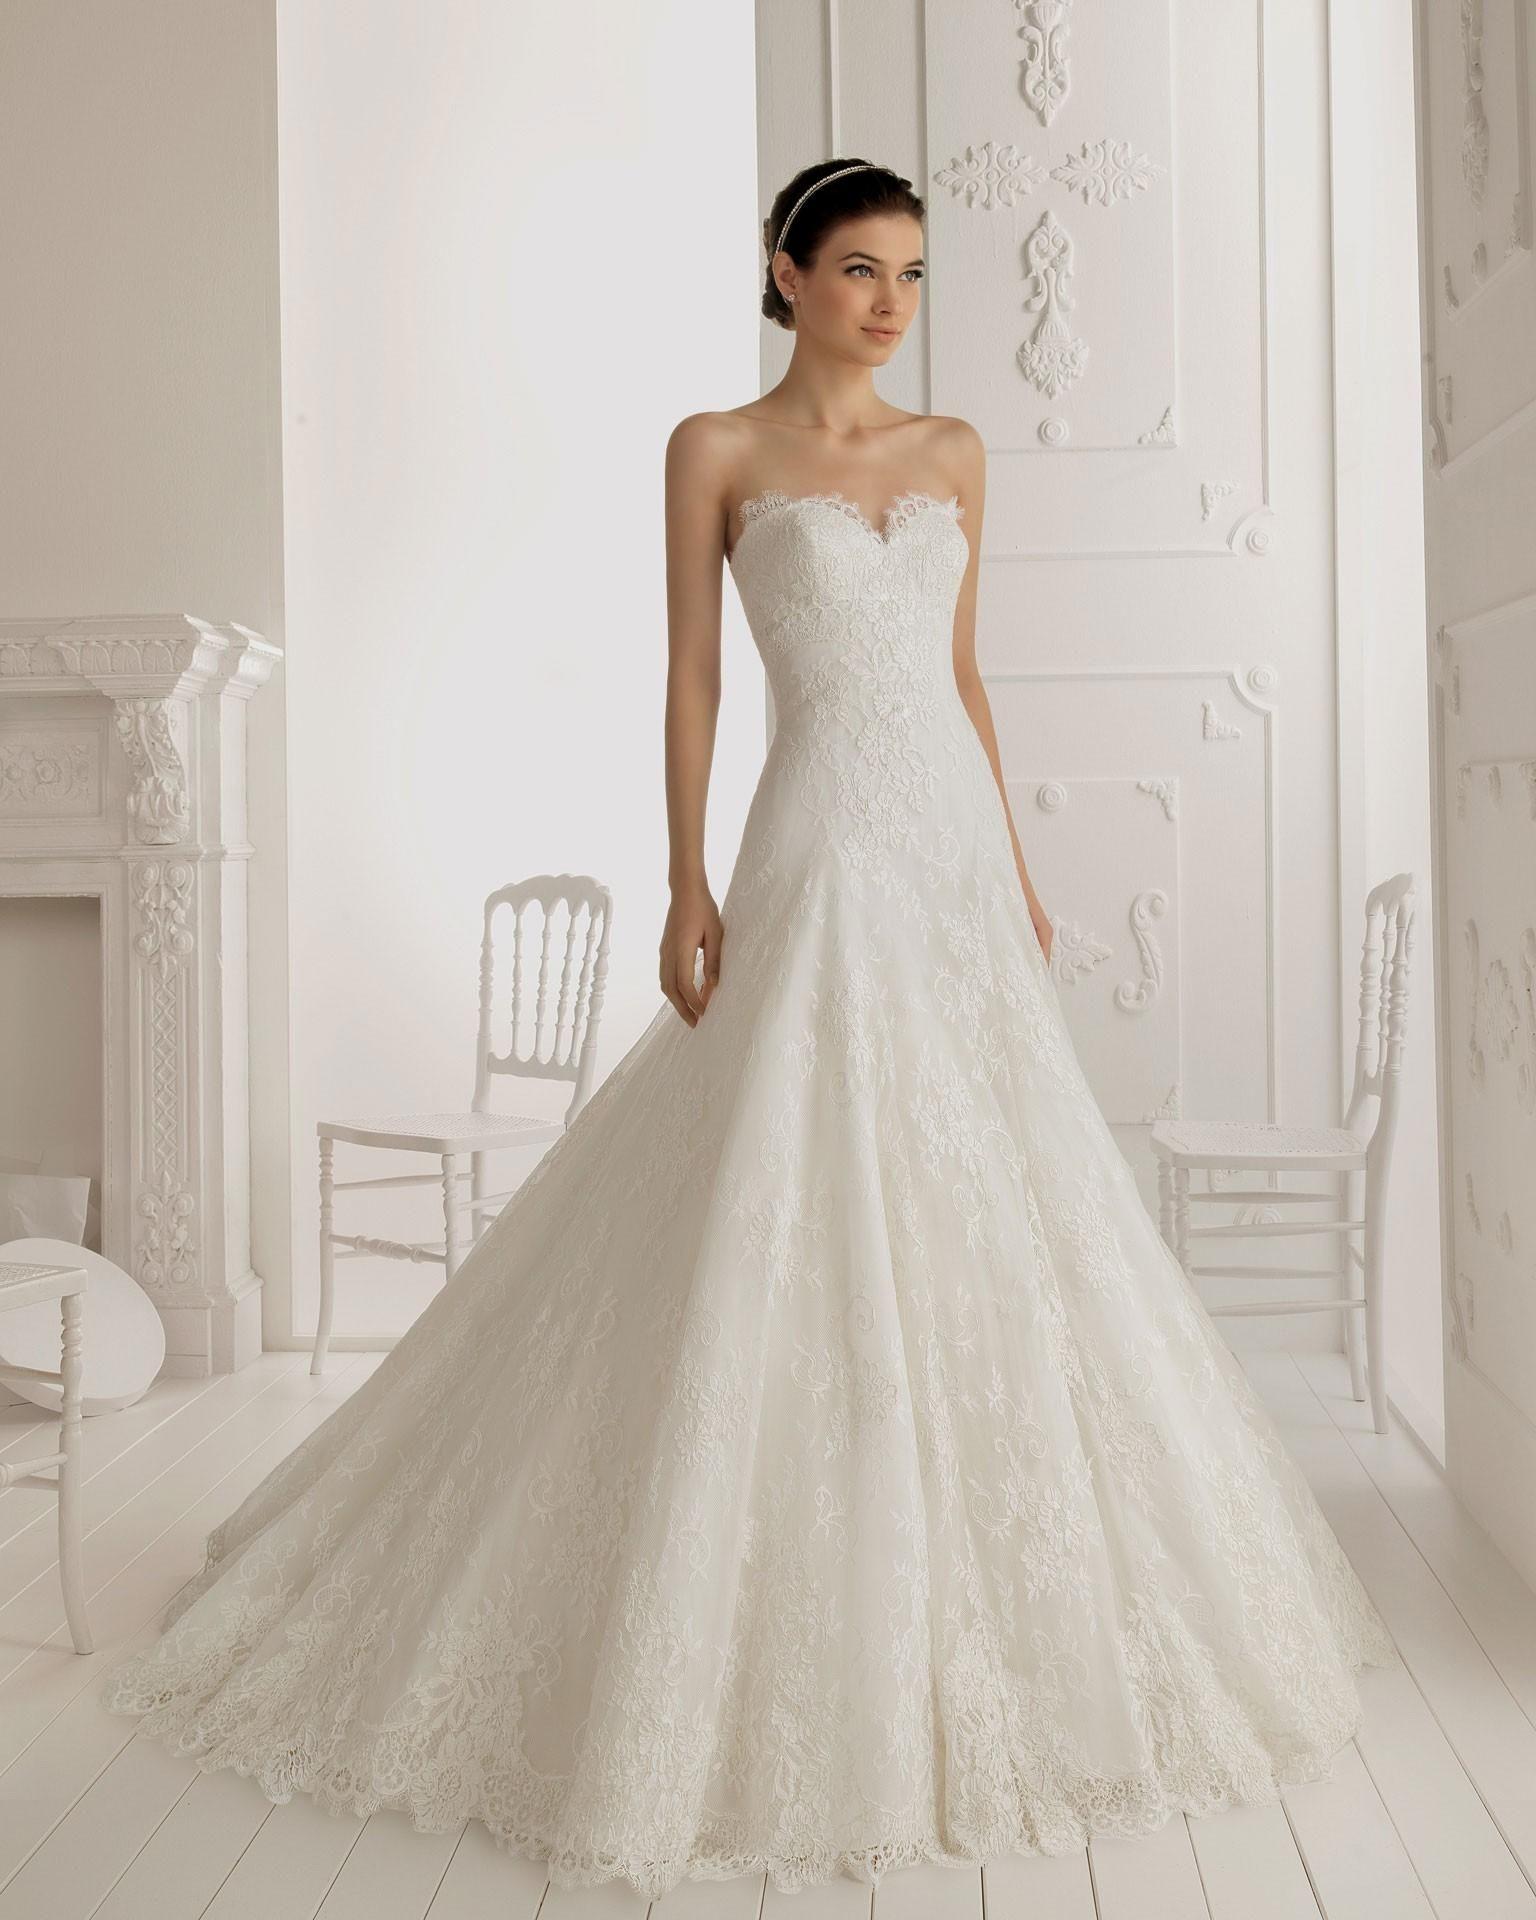 Pin By Jessica Tomaszewski On Wedding Ideas   Pinterest   Drop Waist, Wedding  Dress And Weddings